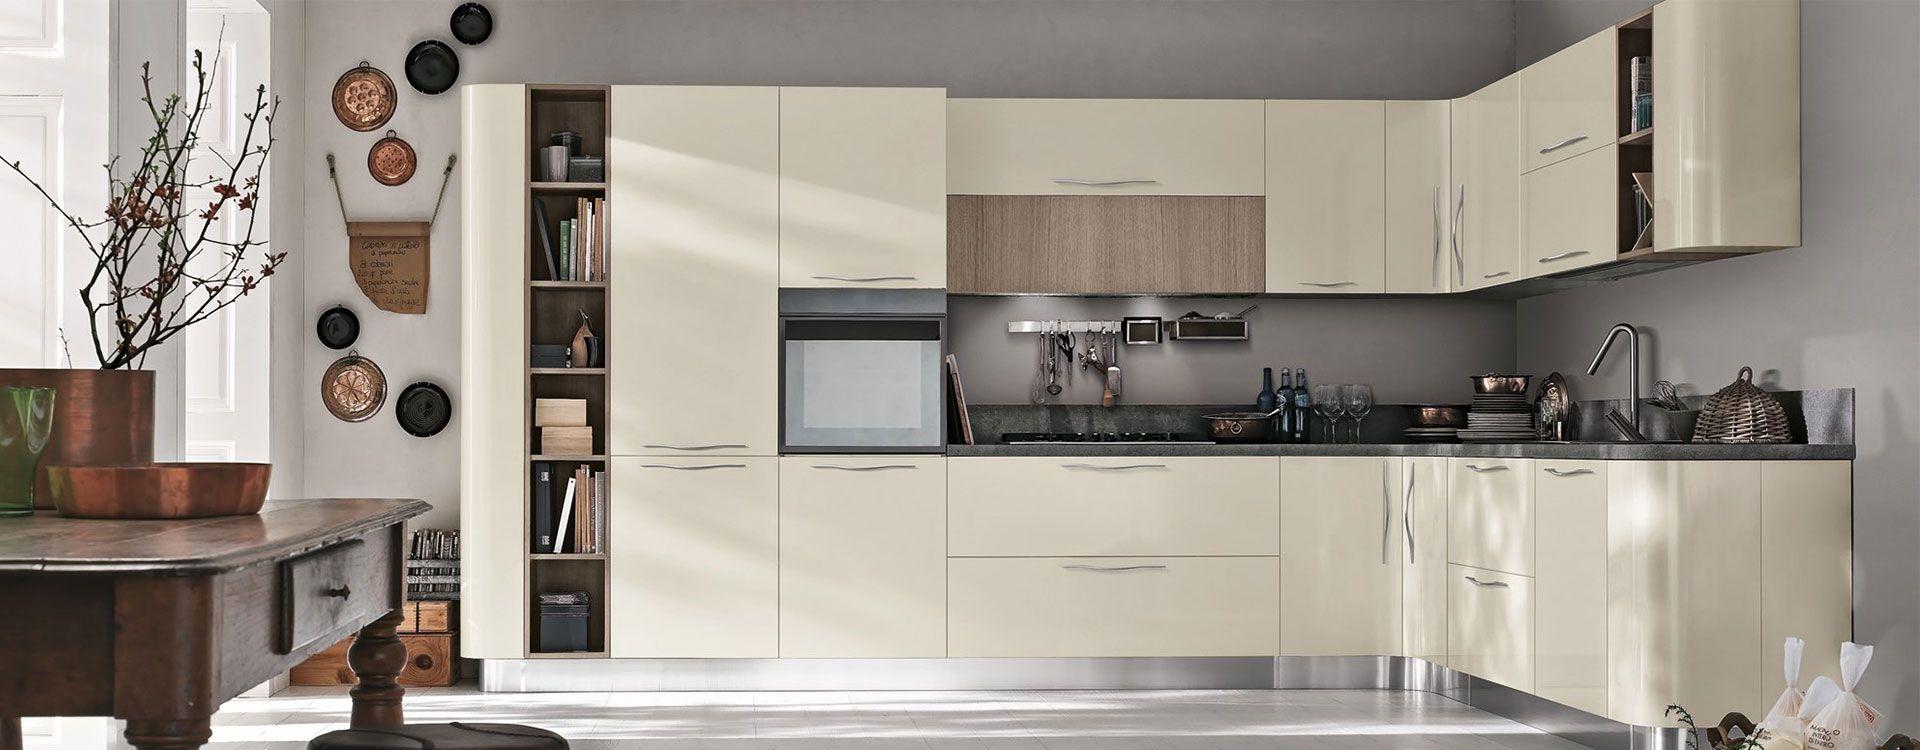 Aluminium Modular Kitchen Coimbatore   Merlok Lifespaces India Pvt.Ltd